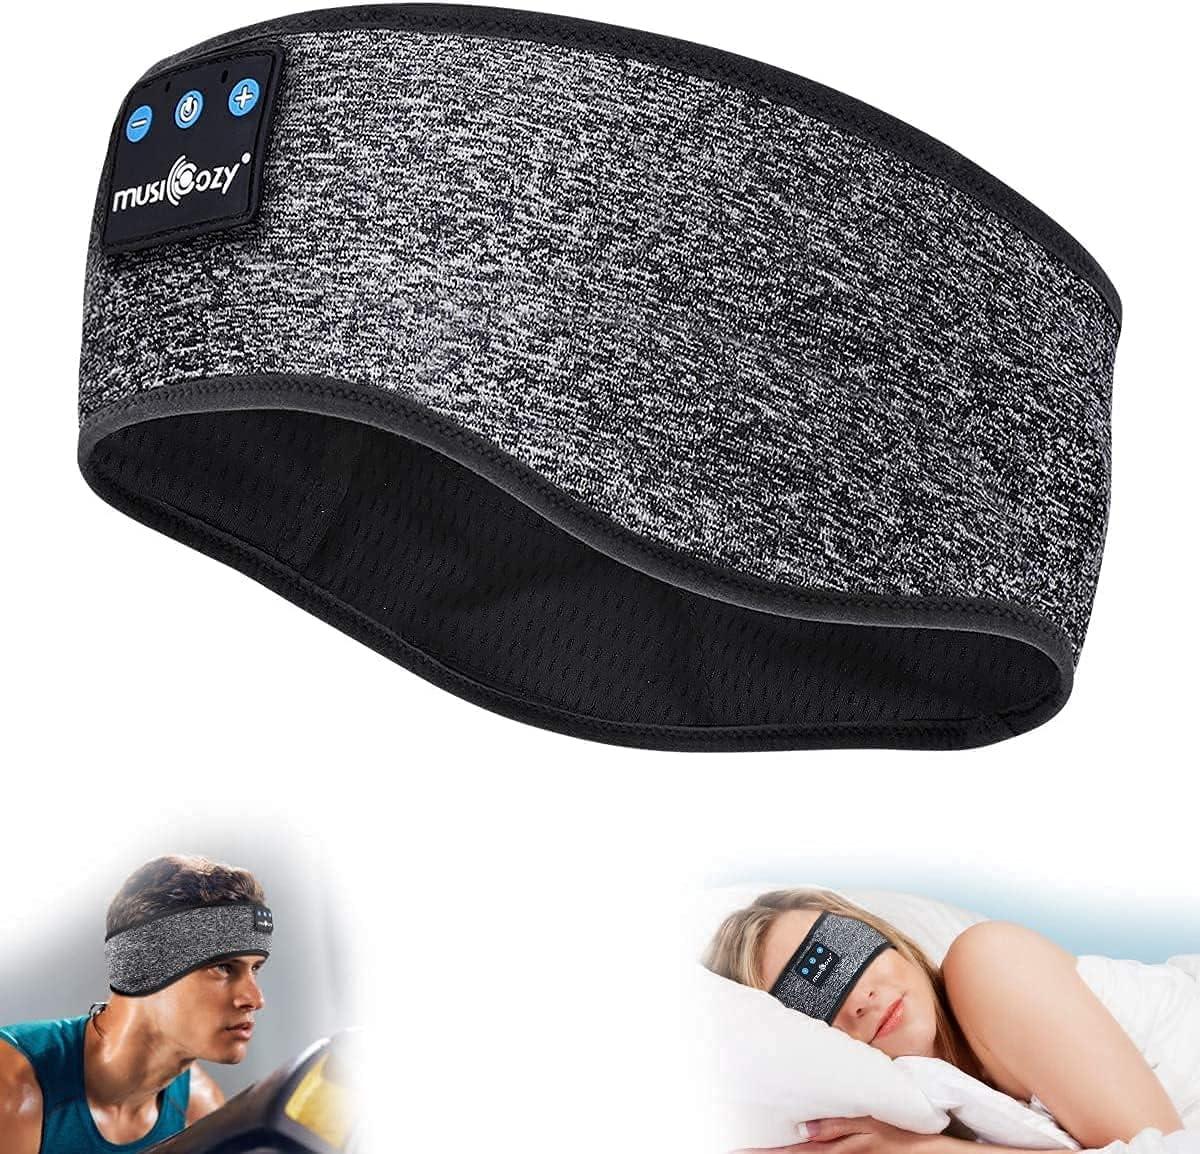 MUSICOZY Sleep Headphones For ASMR